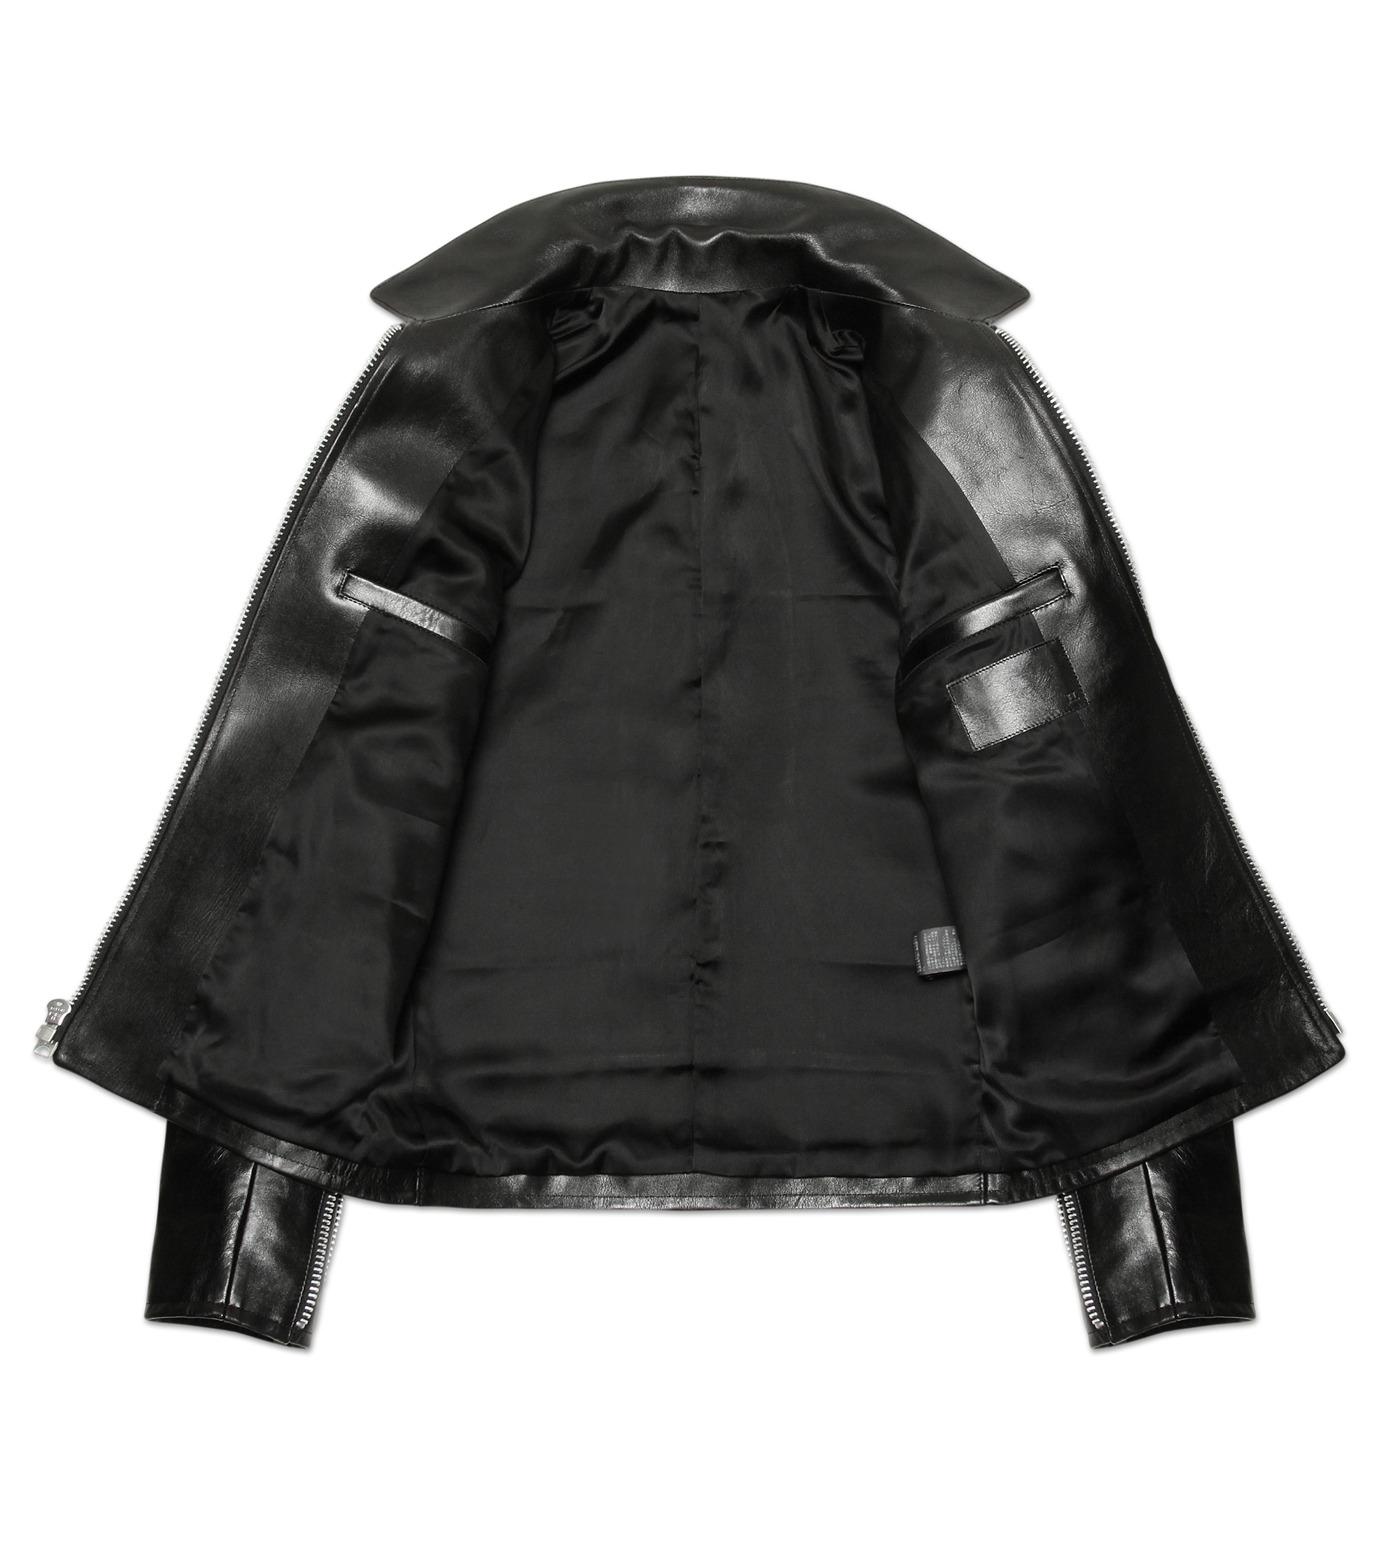 HL HEDDIE LOVU(エイチエル・エディールーヴ)のHL Riders S JK-BLACK(ジャケット/jacket)-17S94002-13 拡大詳細画像3